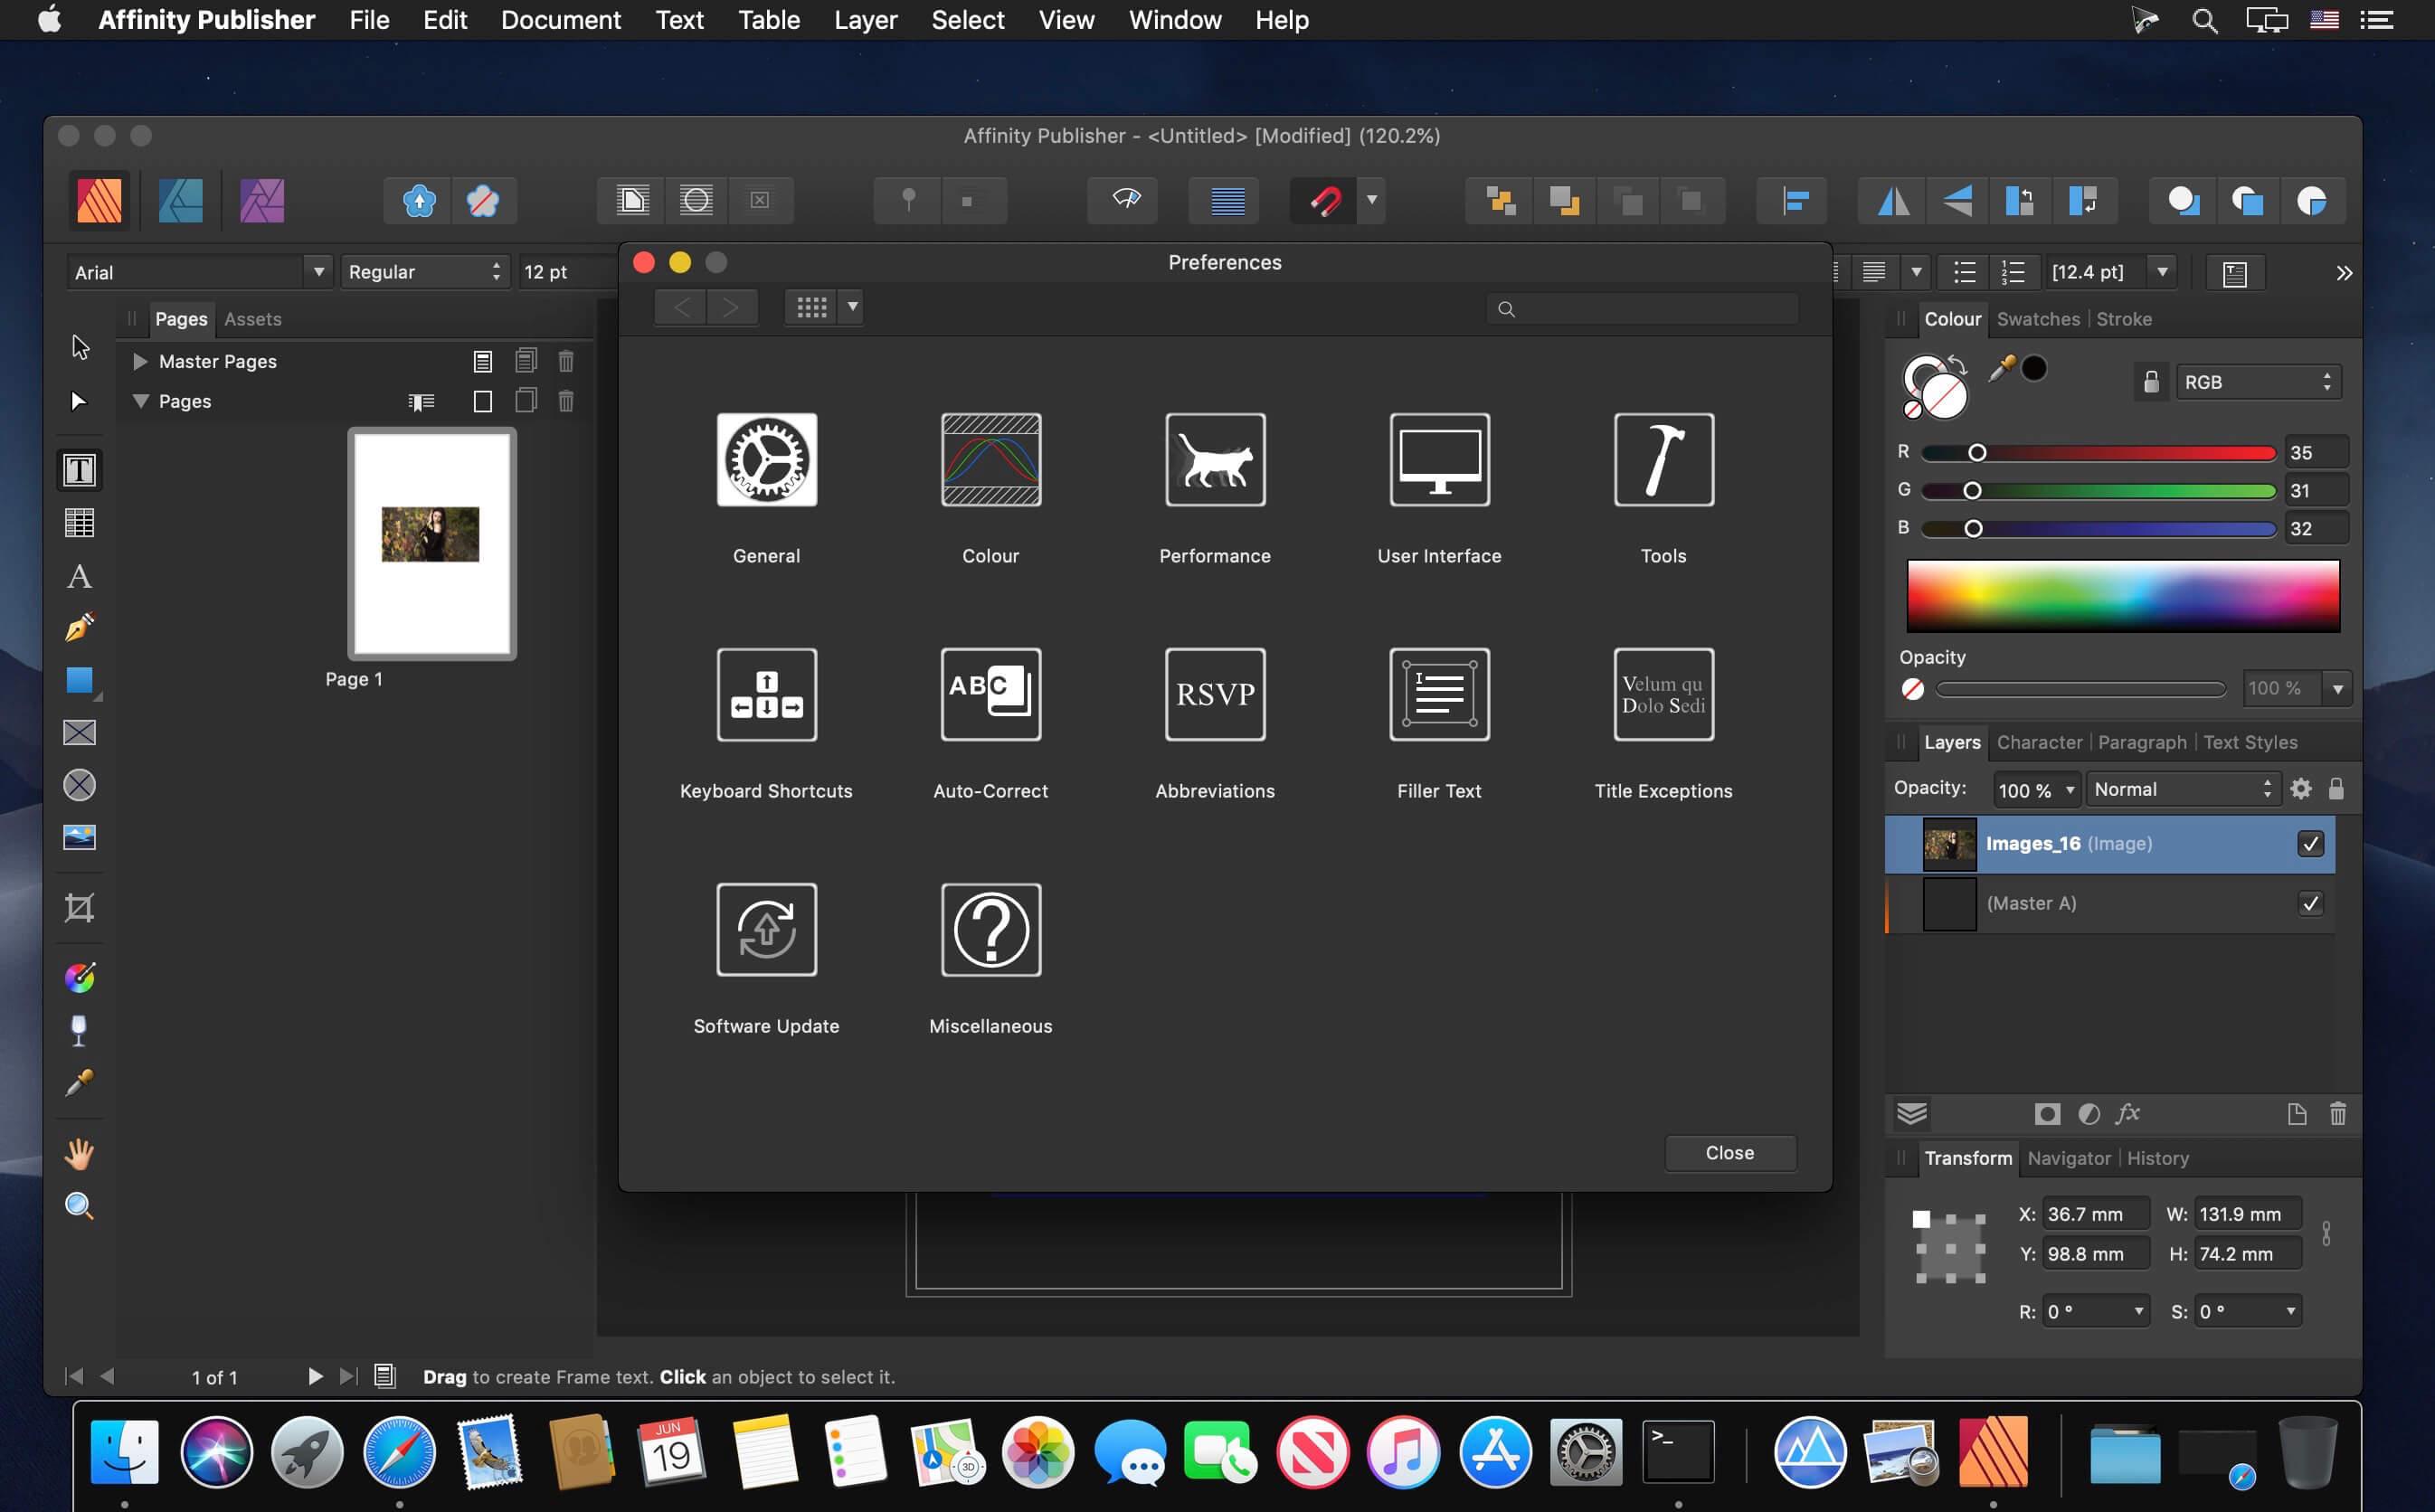 「macOS」Affinity Publisher 破解版下载 图形设计 V1.8.2插图(2)